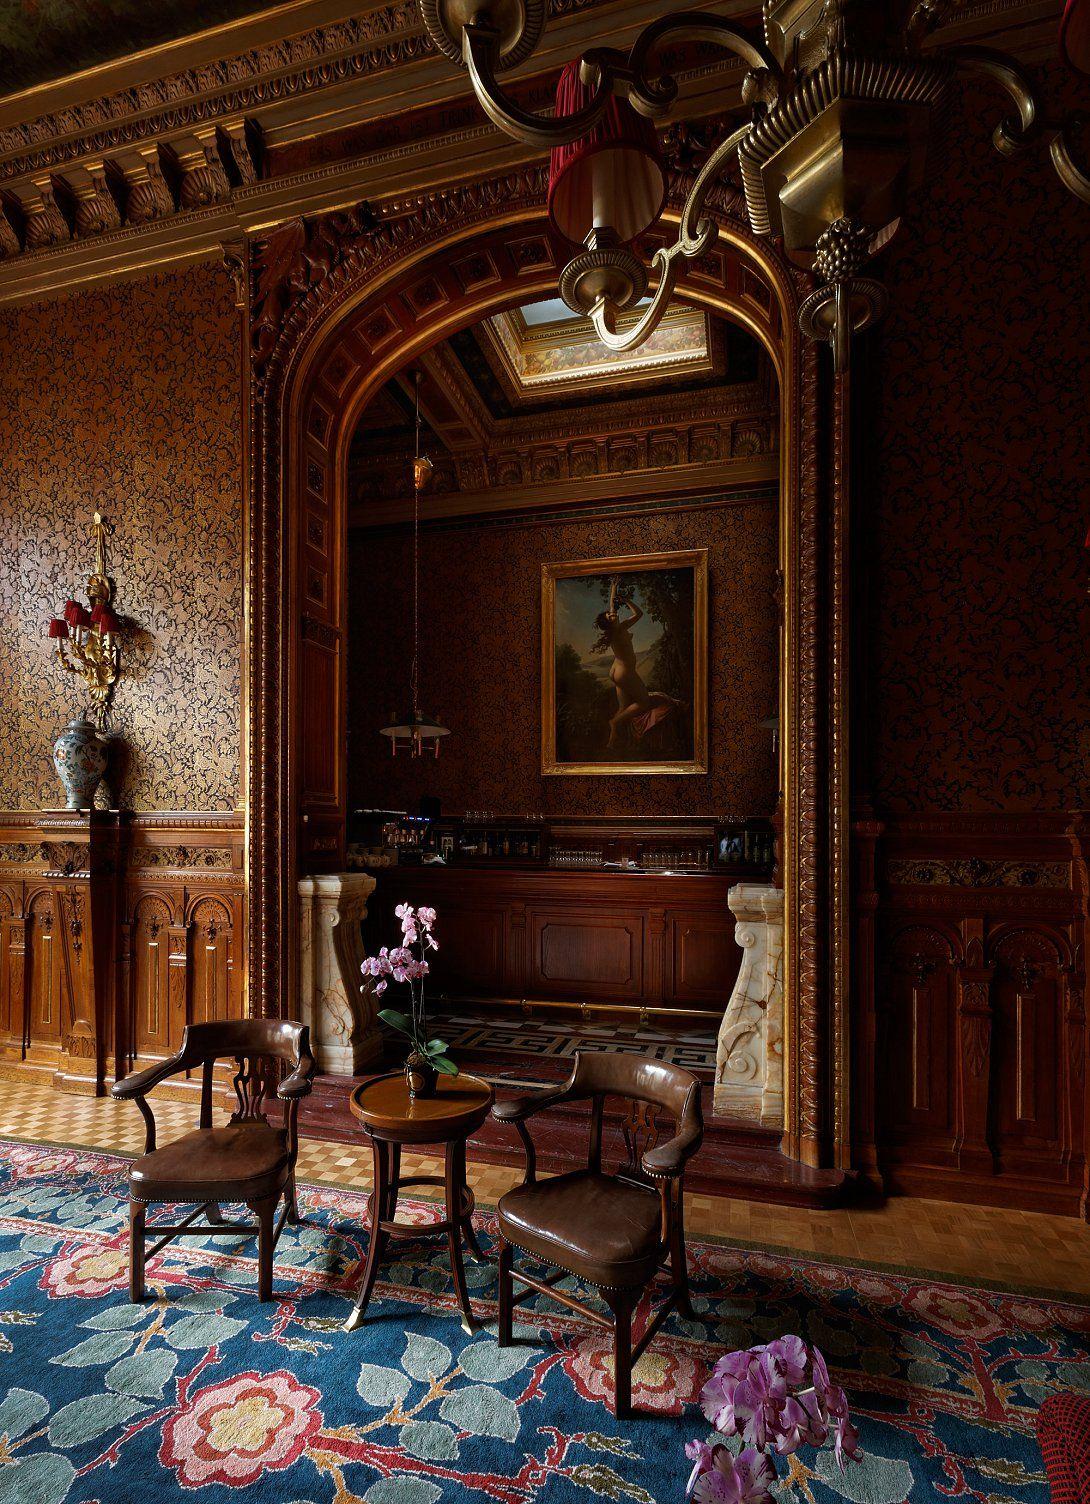 Salle A Manger Paris grande salle à manger - paris | victorian interiors, gothic